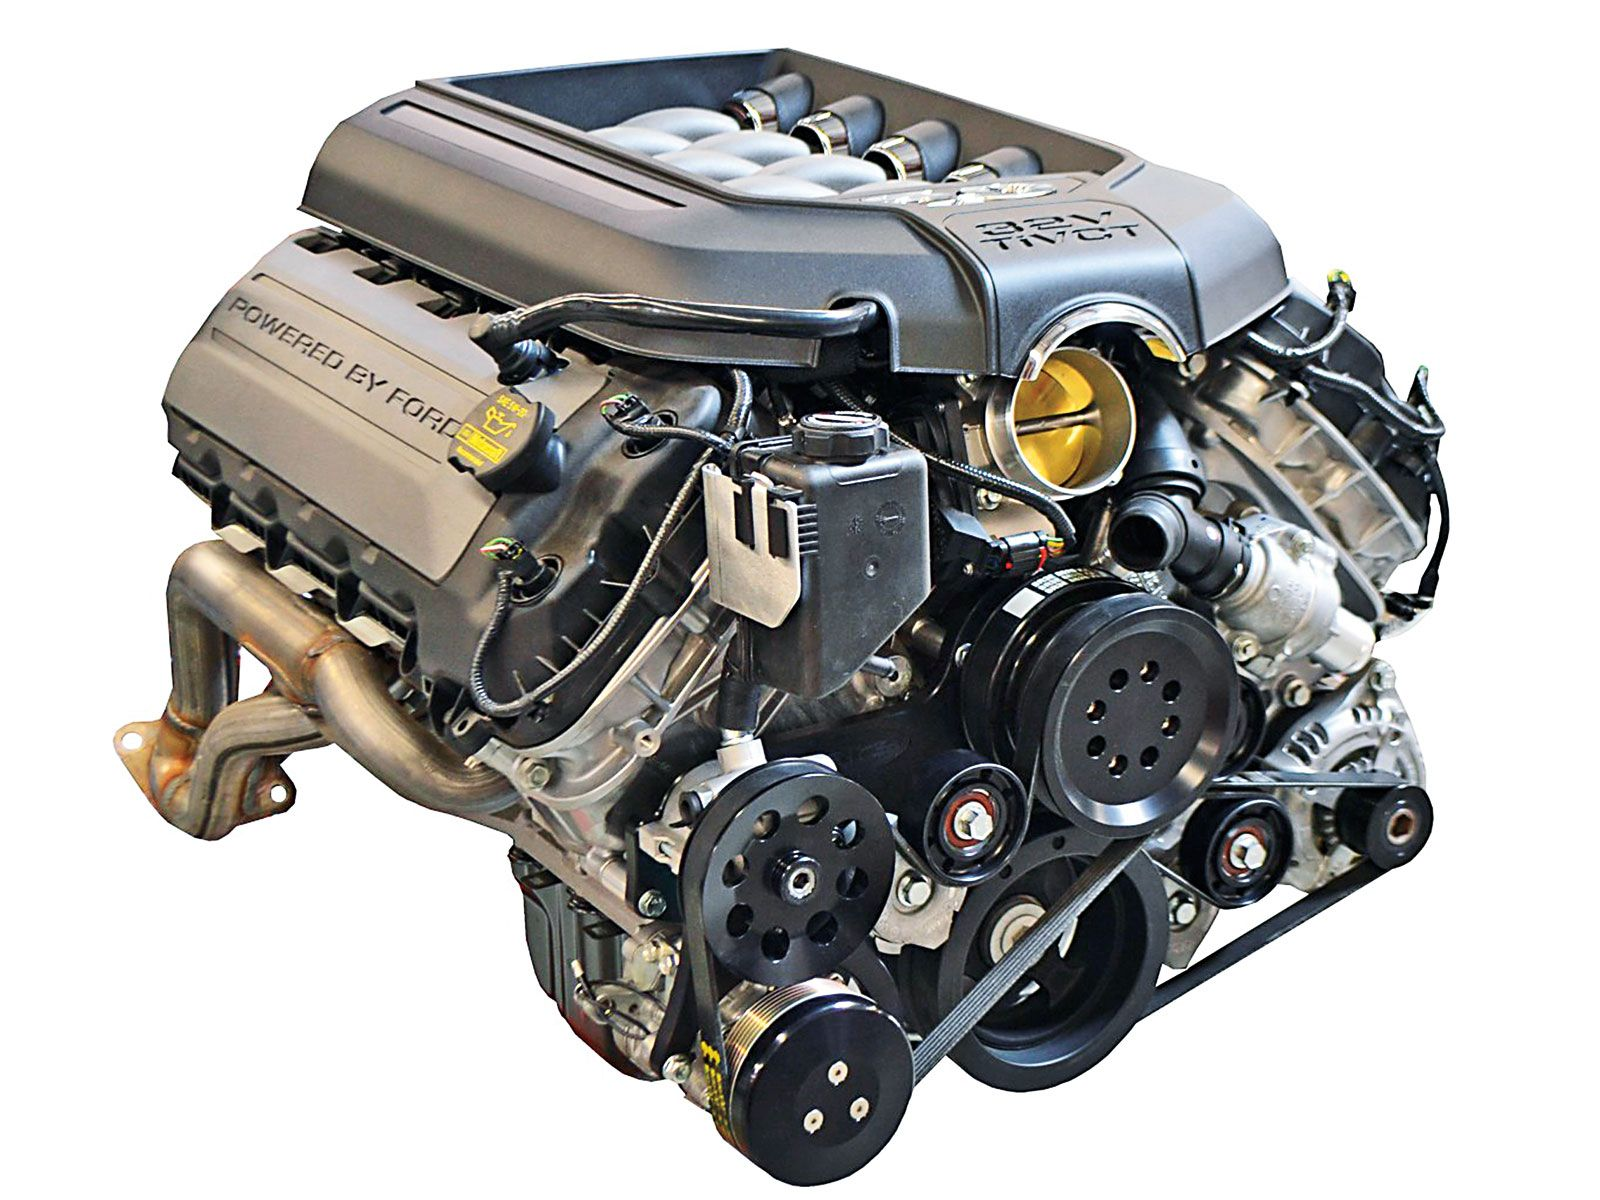 Hod Rod's Coyote V8 Engine Swap Guide | Engines | Engine